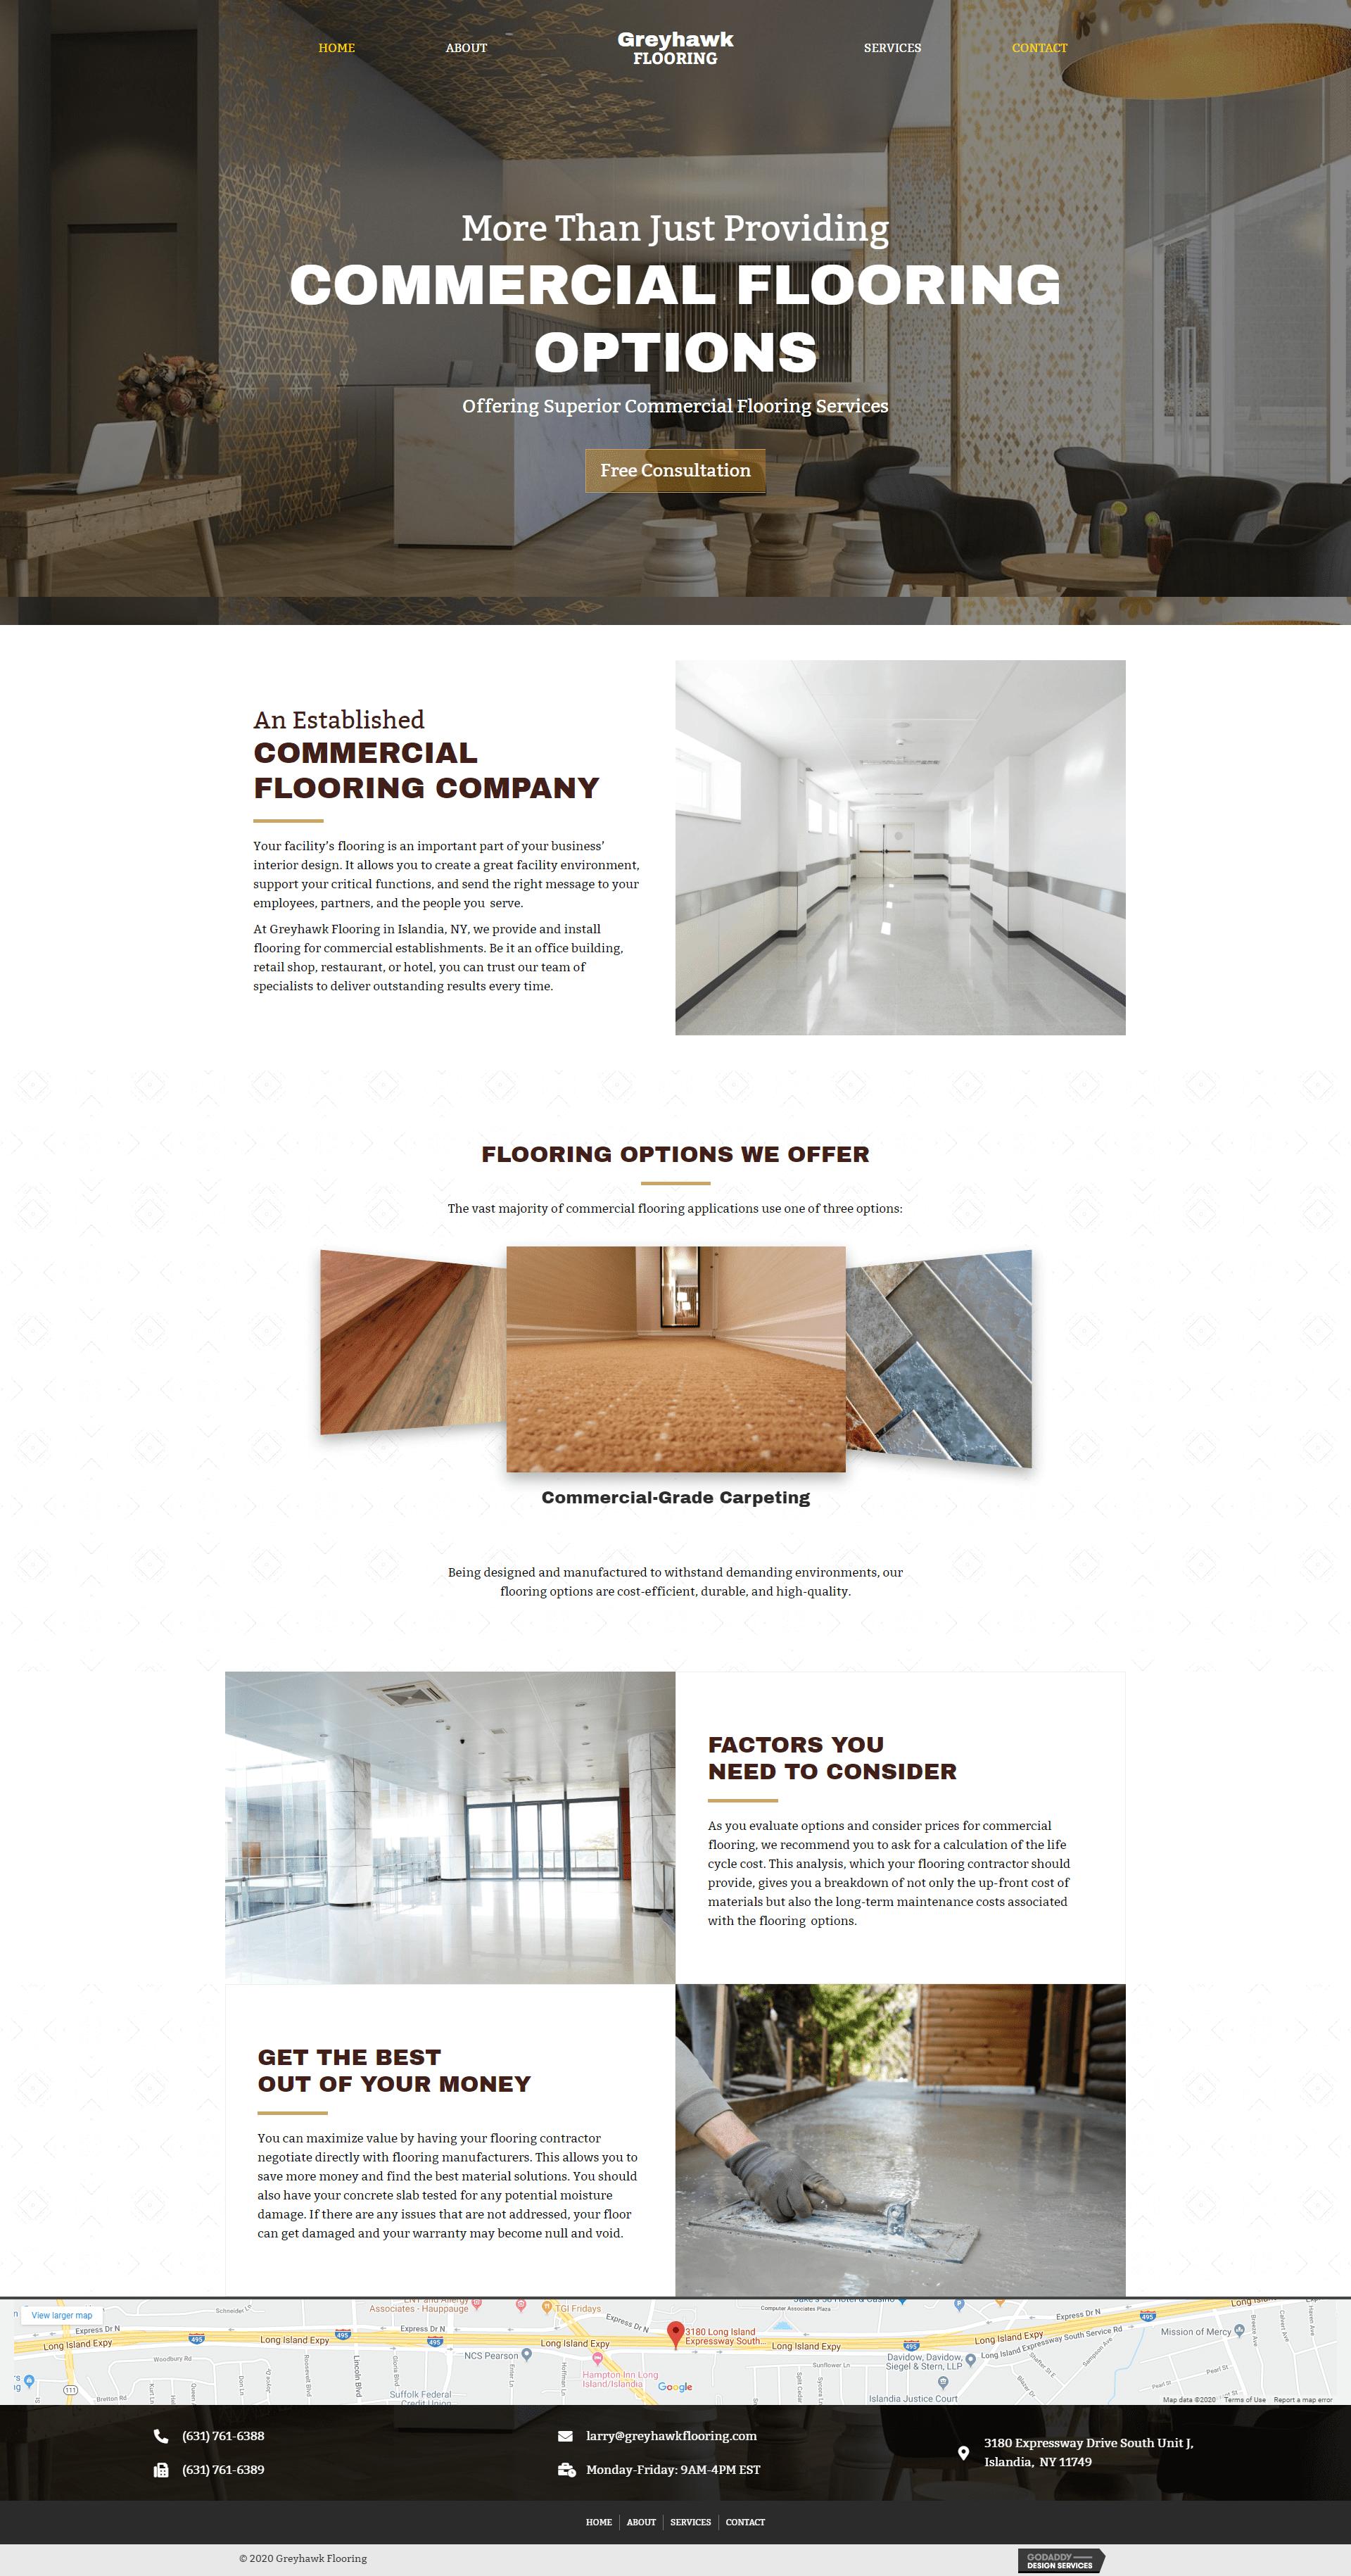 Home - Greyhawk Flooring